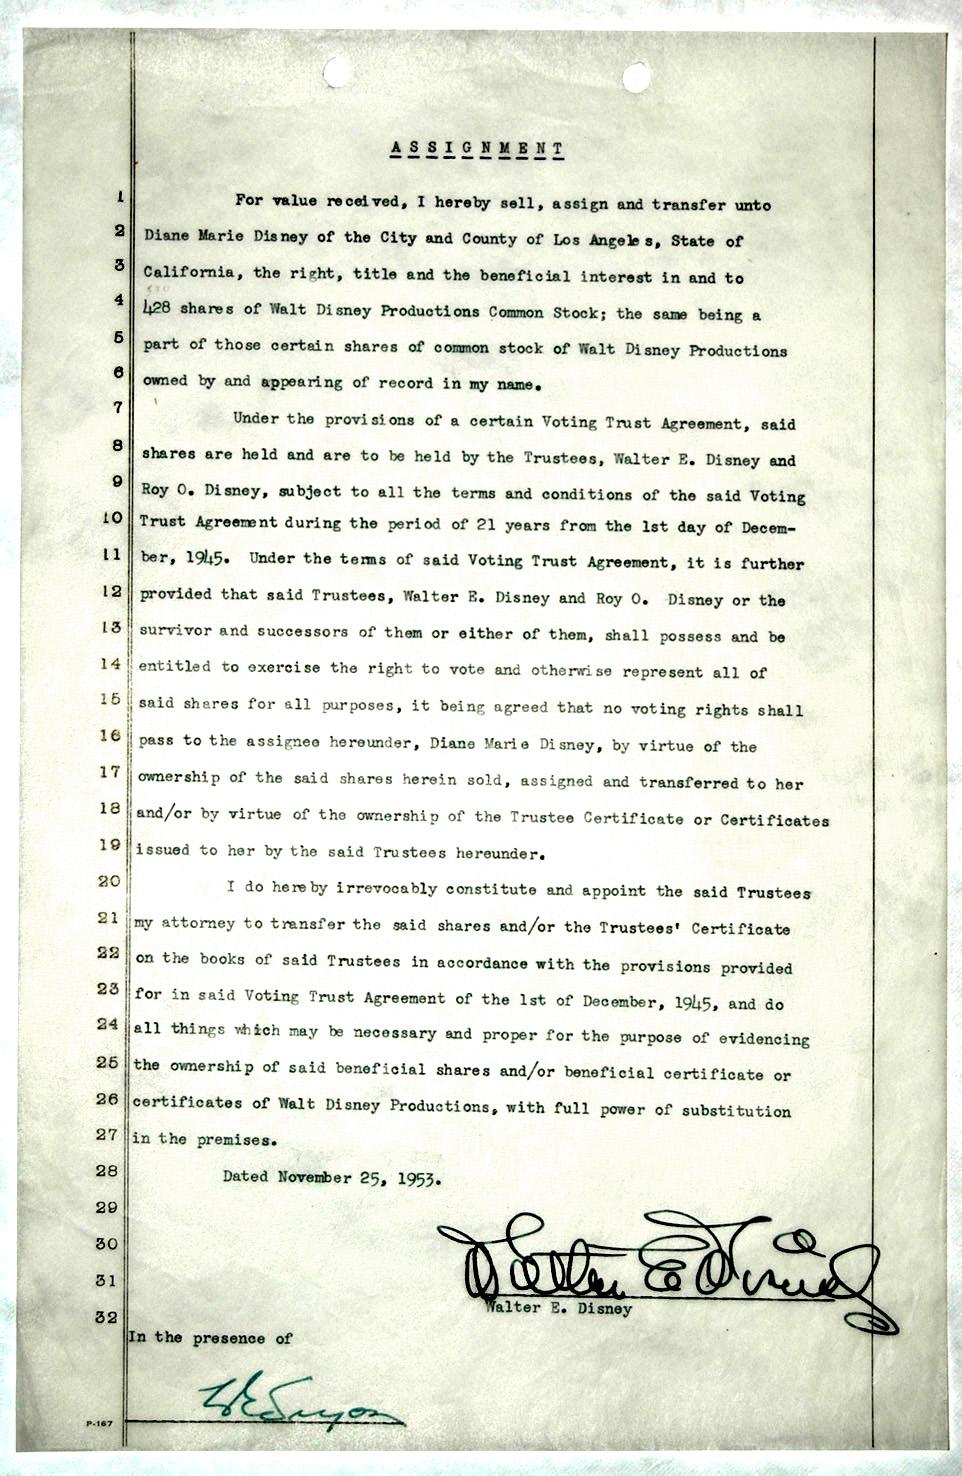 Walt Disney Autograph Walt Disney Signed Stock Transfer Document -- 1953 -- Accompanied by PSA/DNA Letter of Authenticity